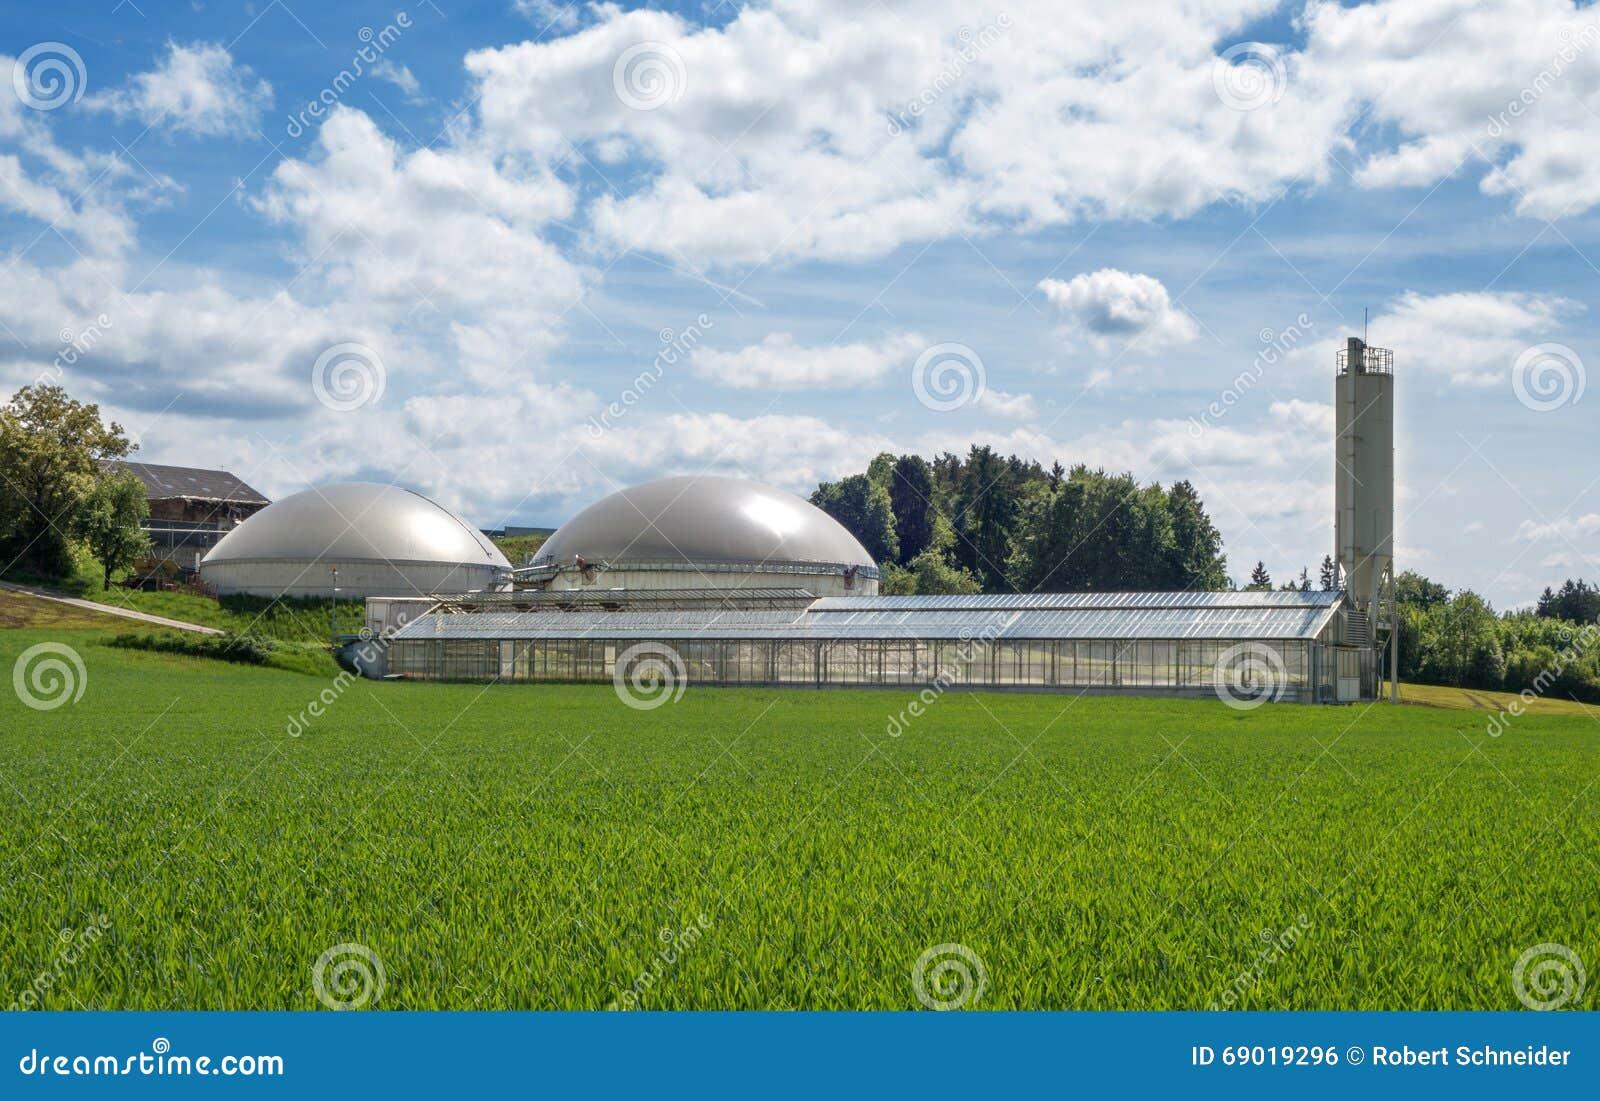 Biogas plant and sewage sludge drying